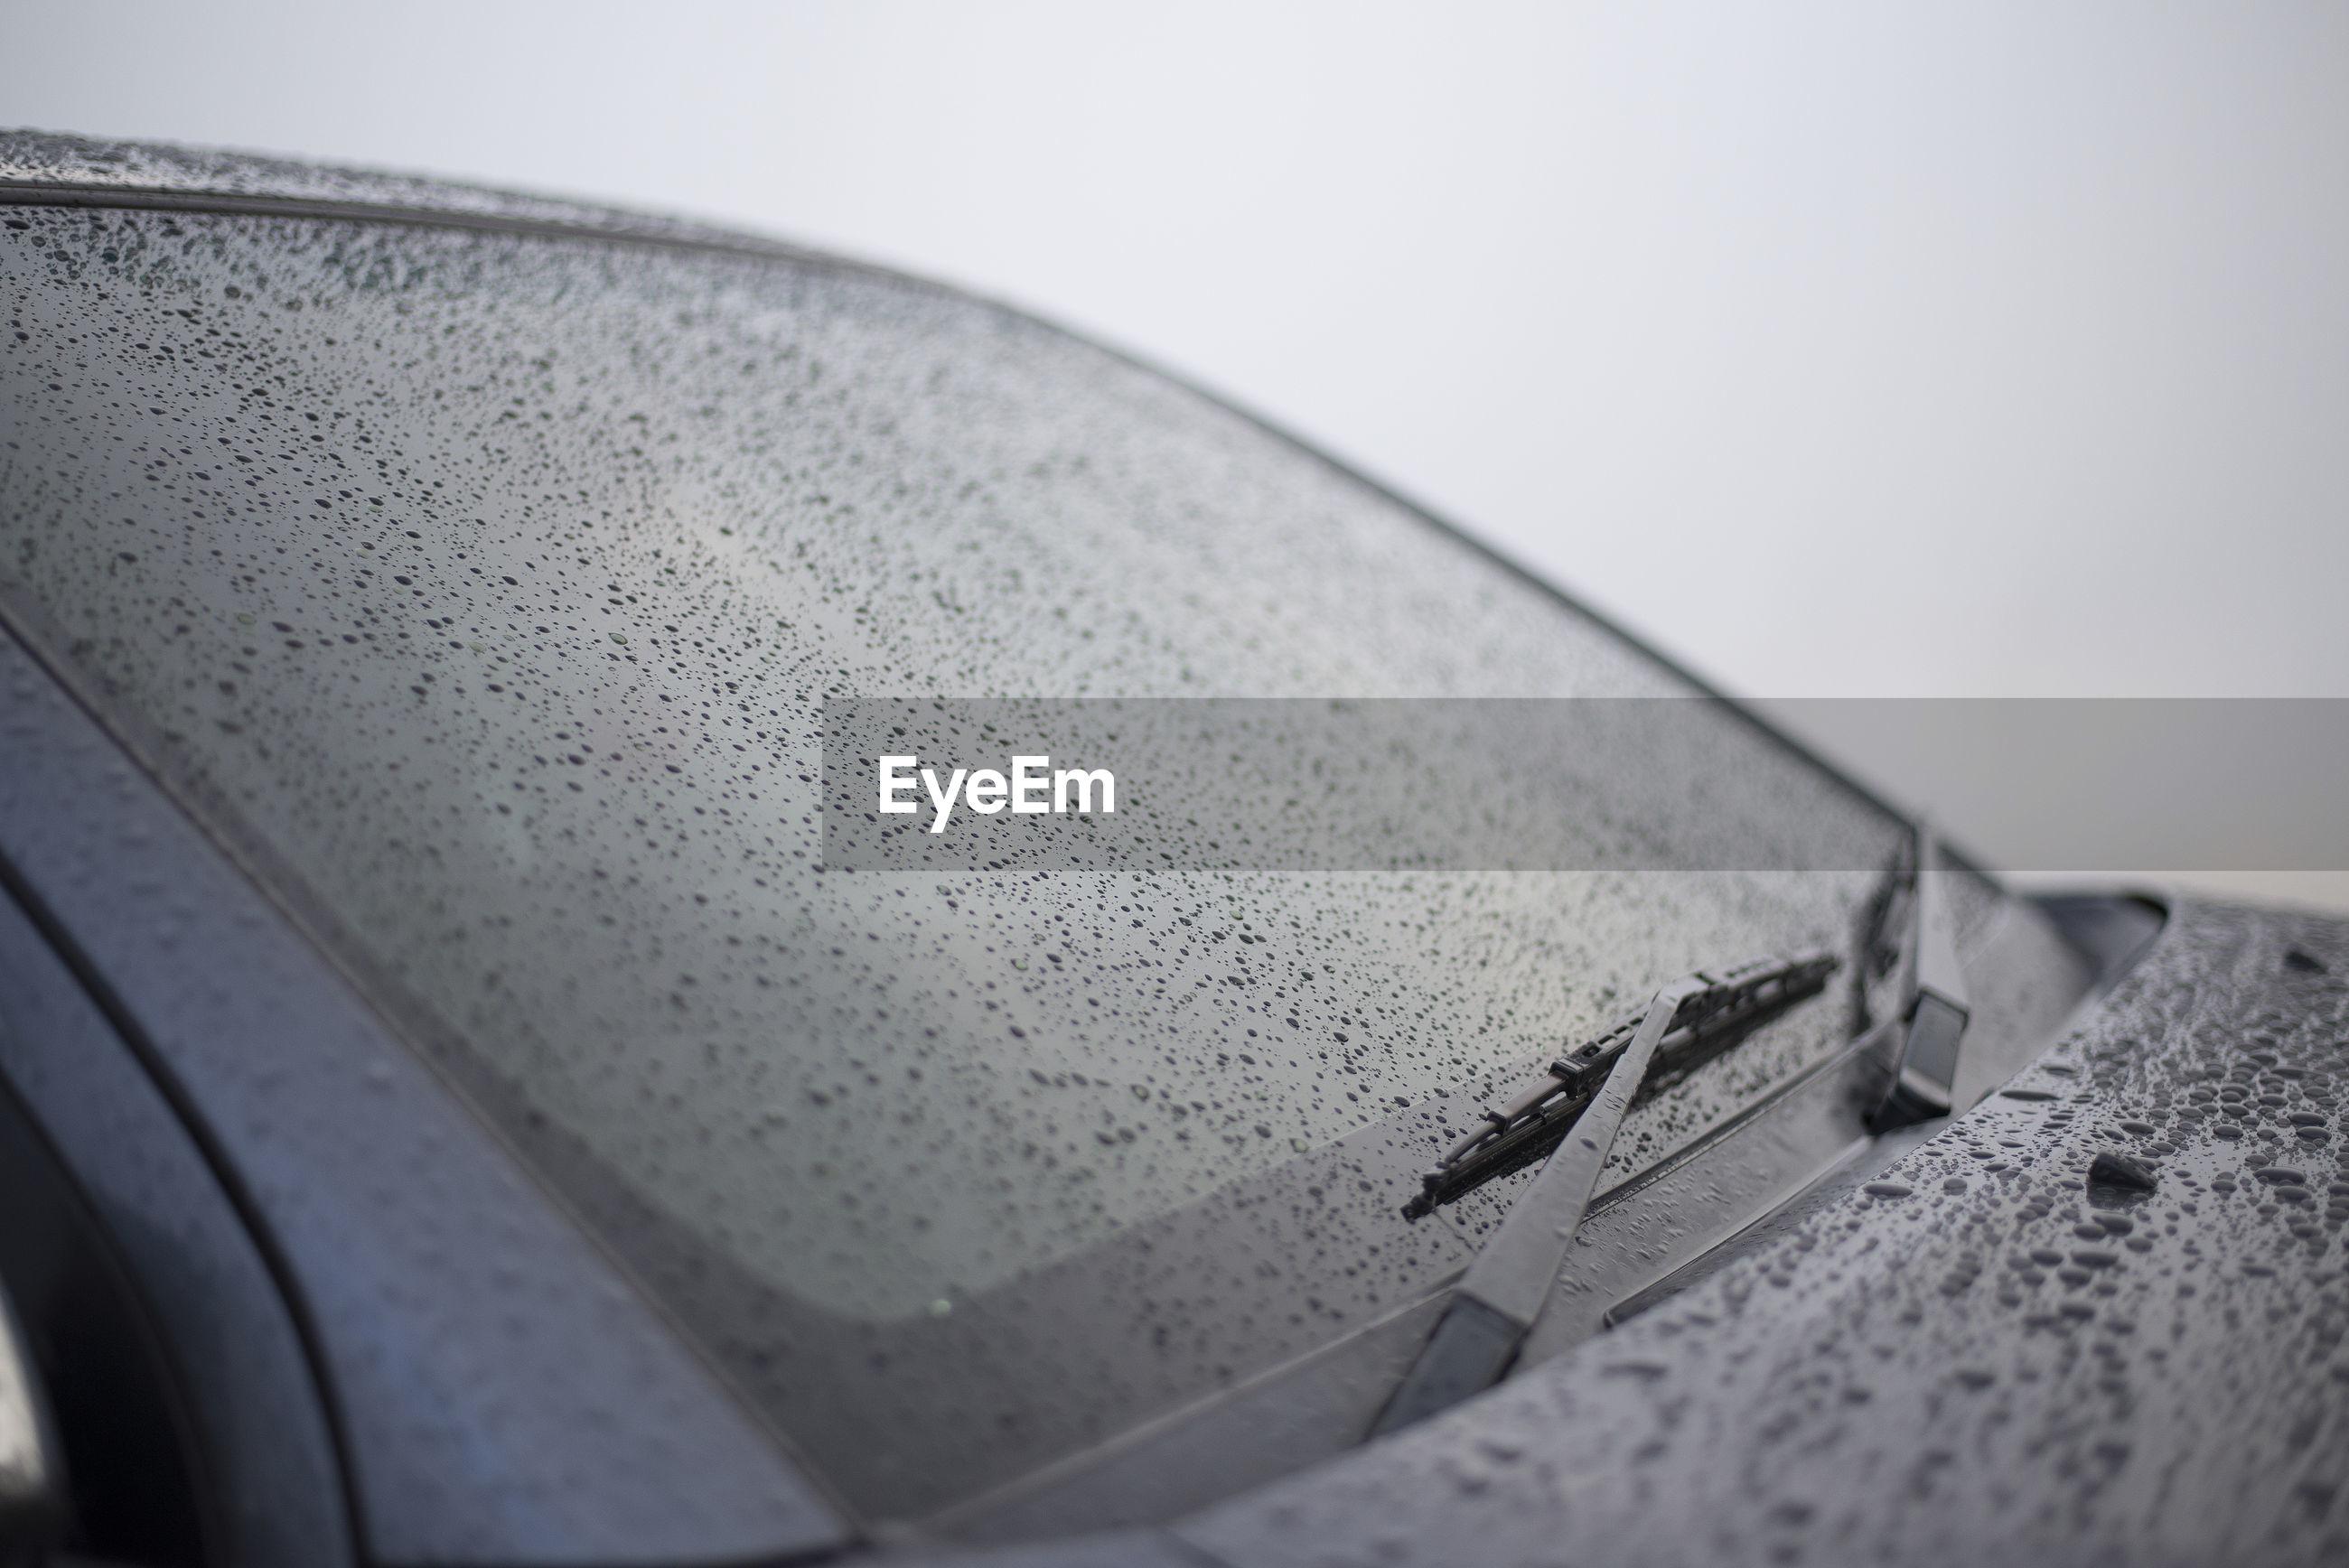 Wet car window during rain